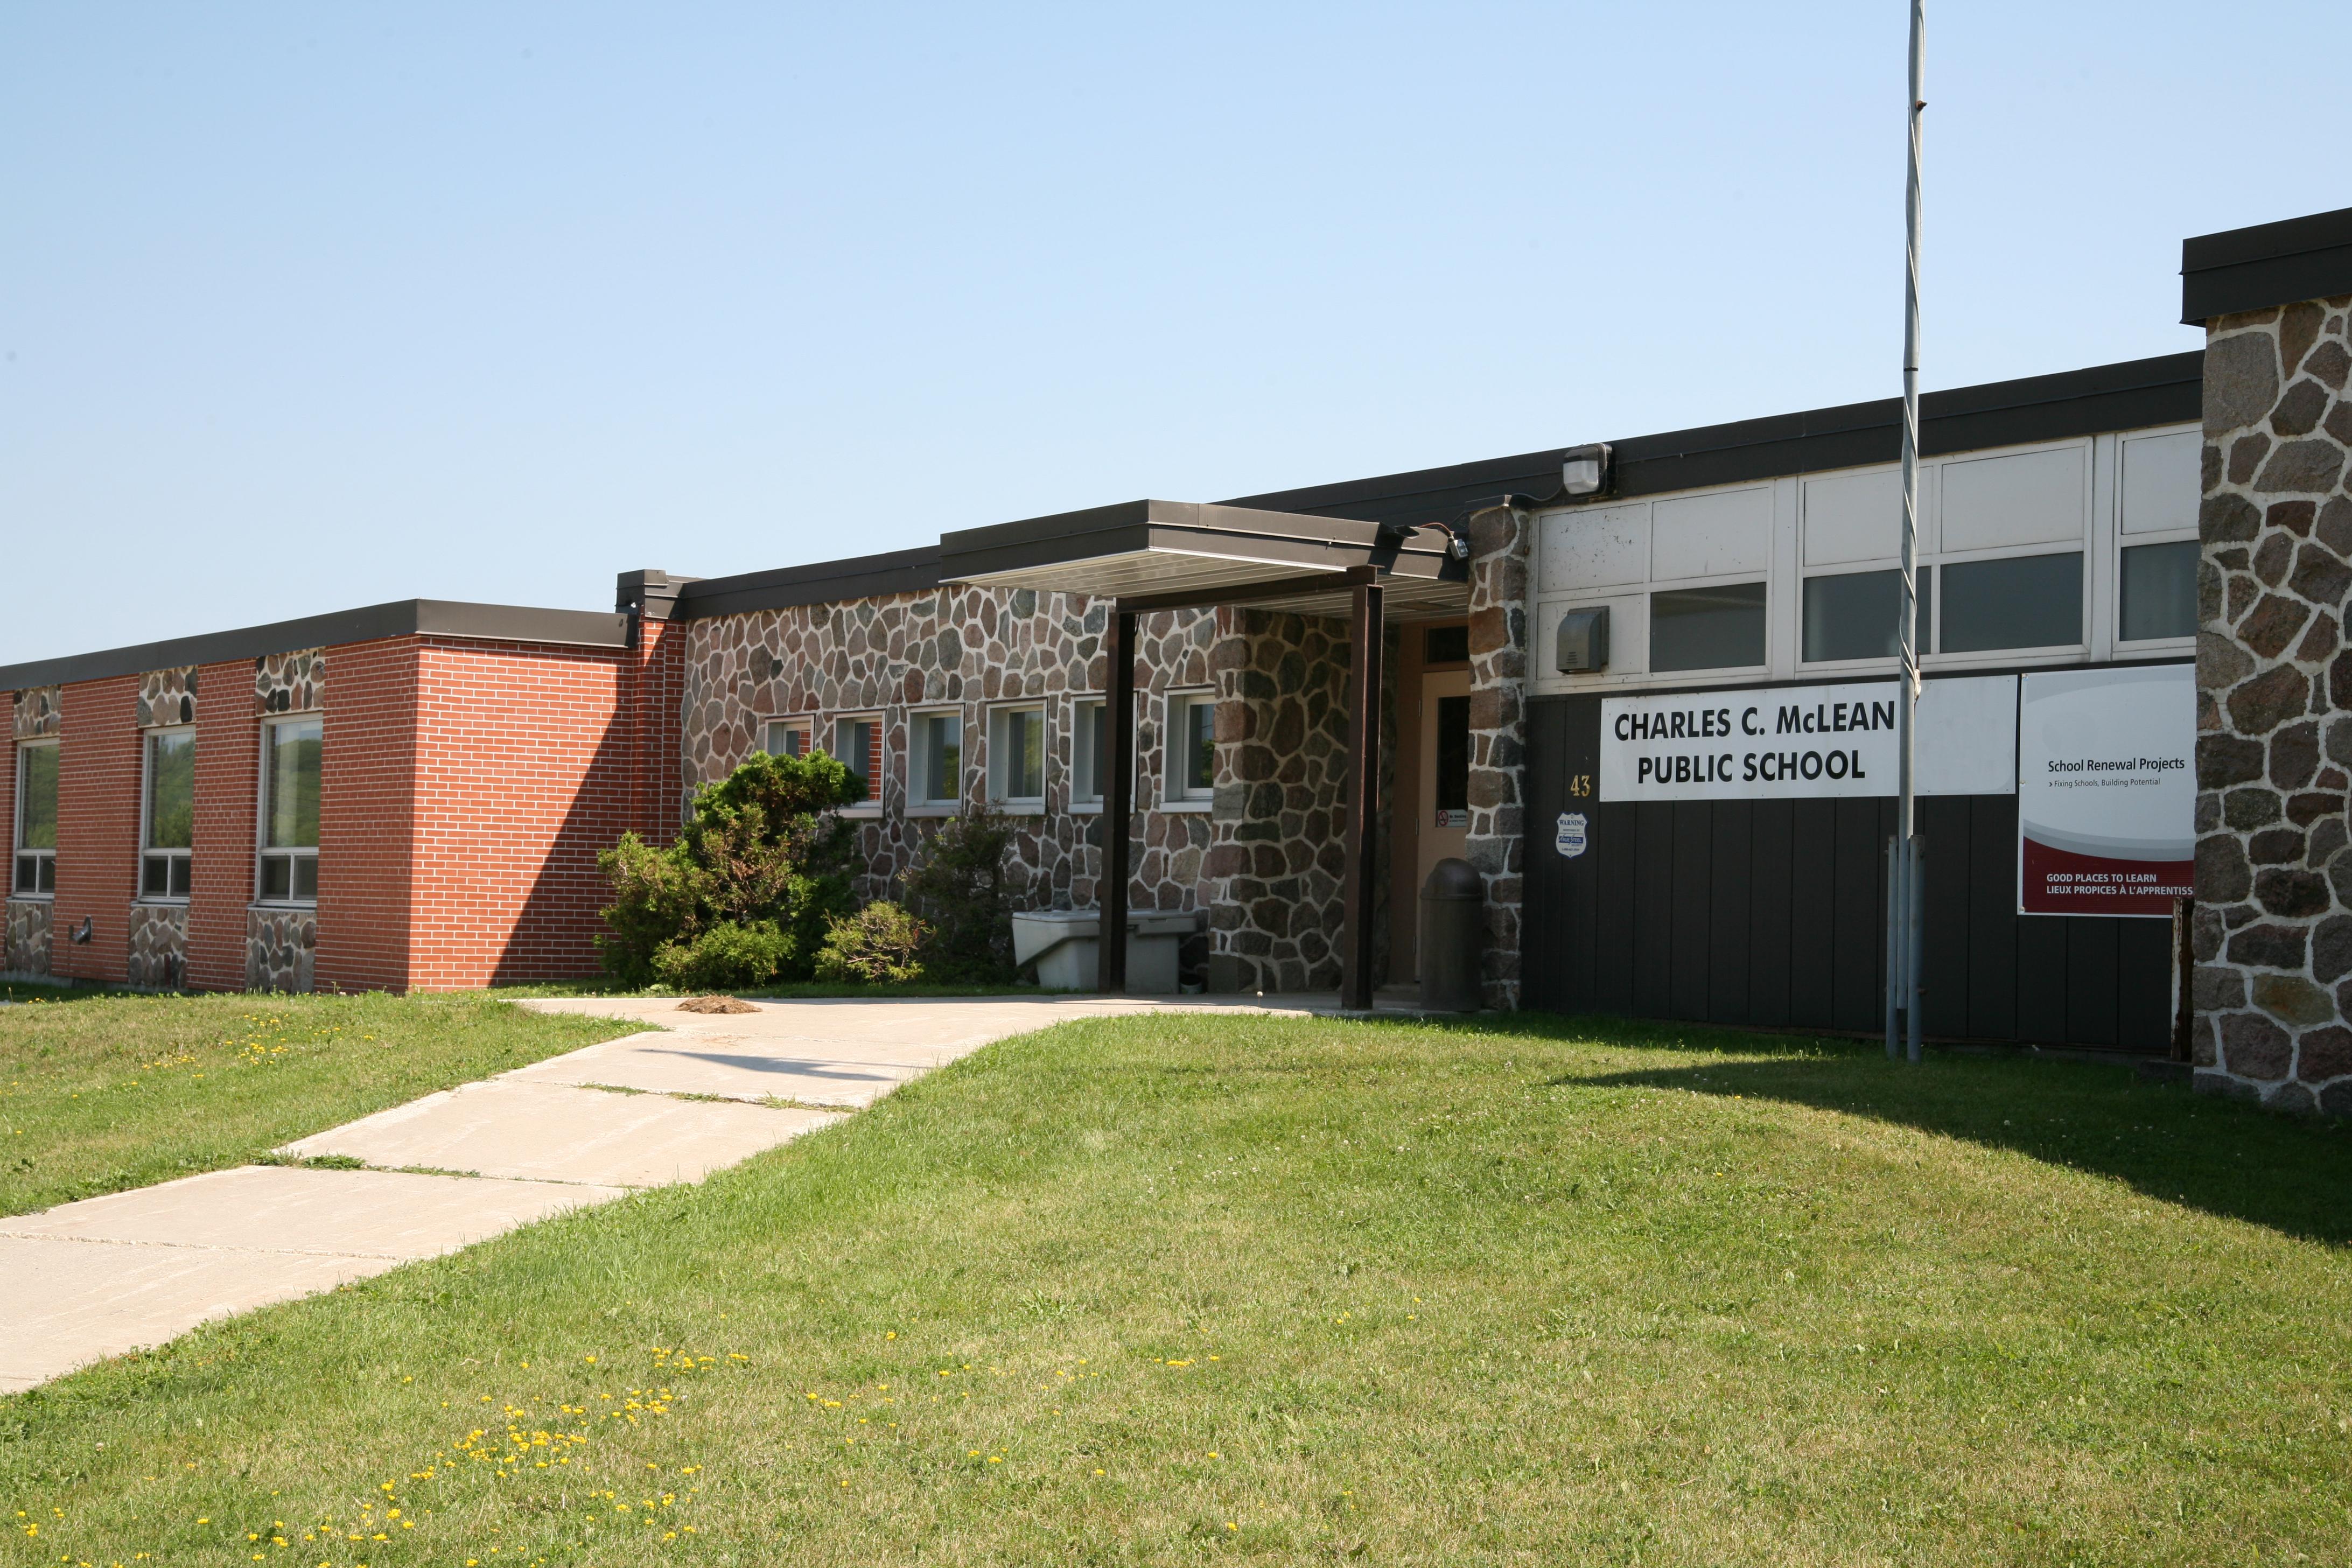 Charles C McLean Public School logo